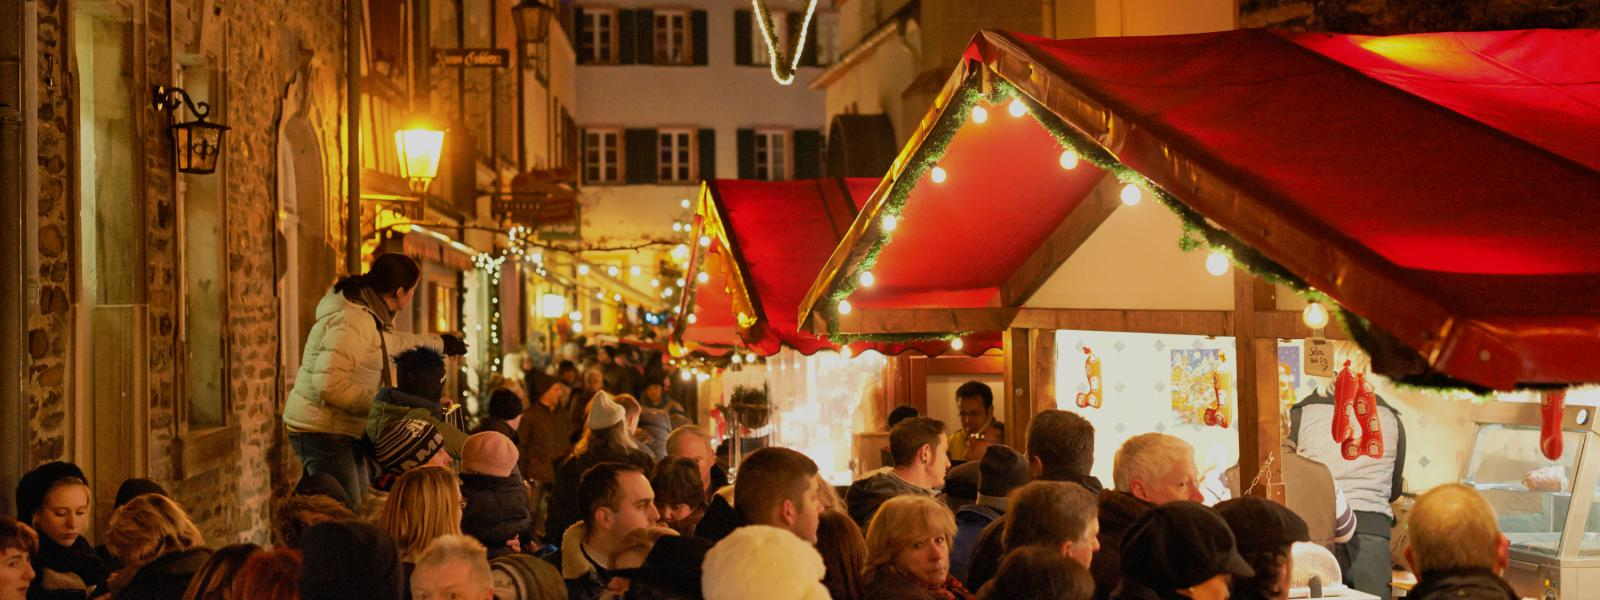 Kerstsfeer Duitsmand - De Globetrotter reizen